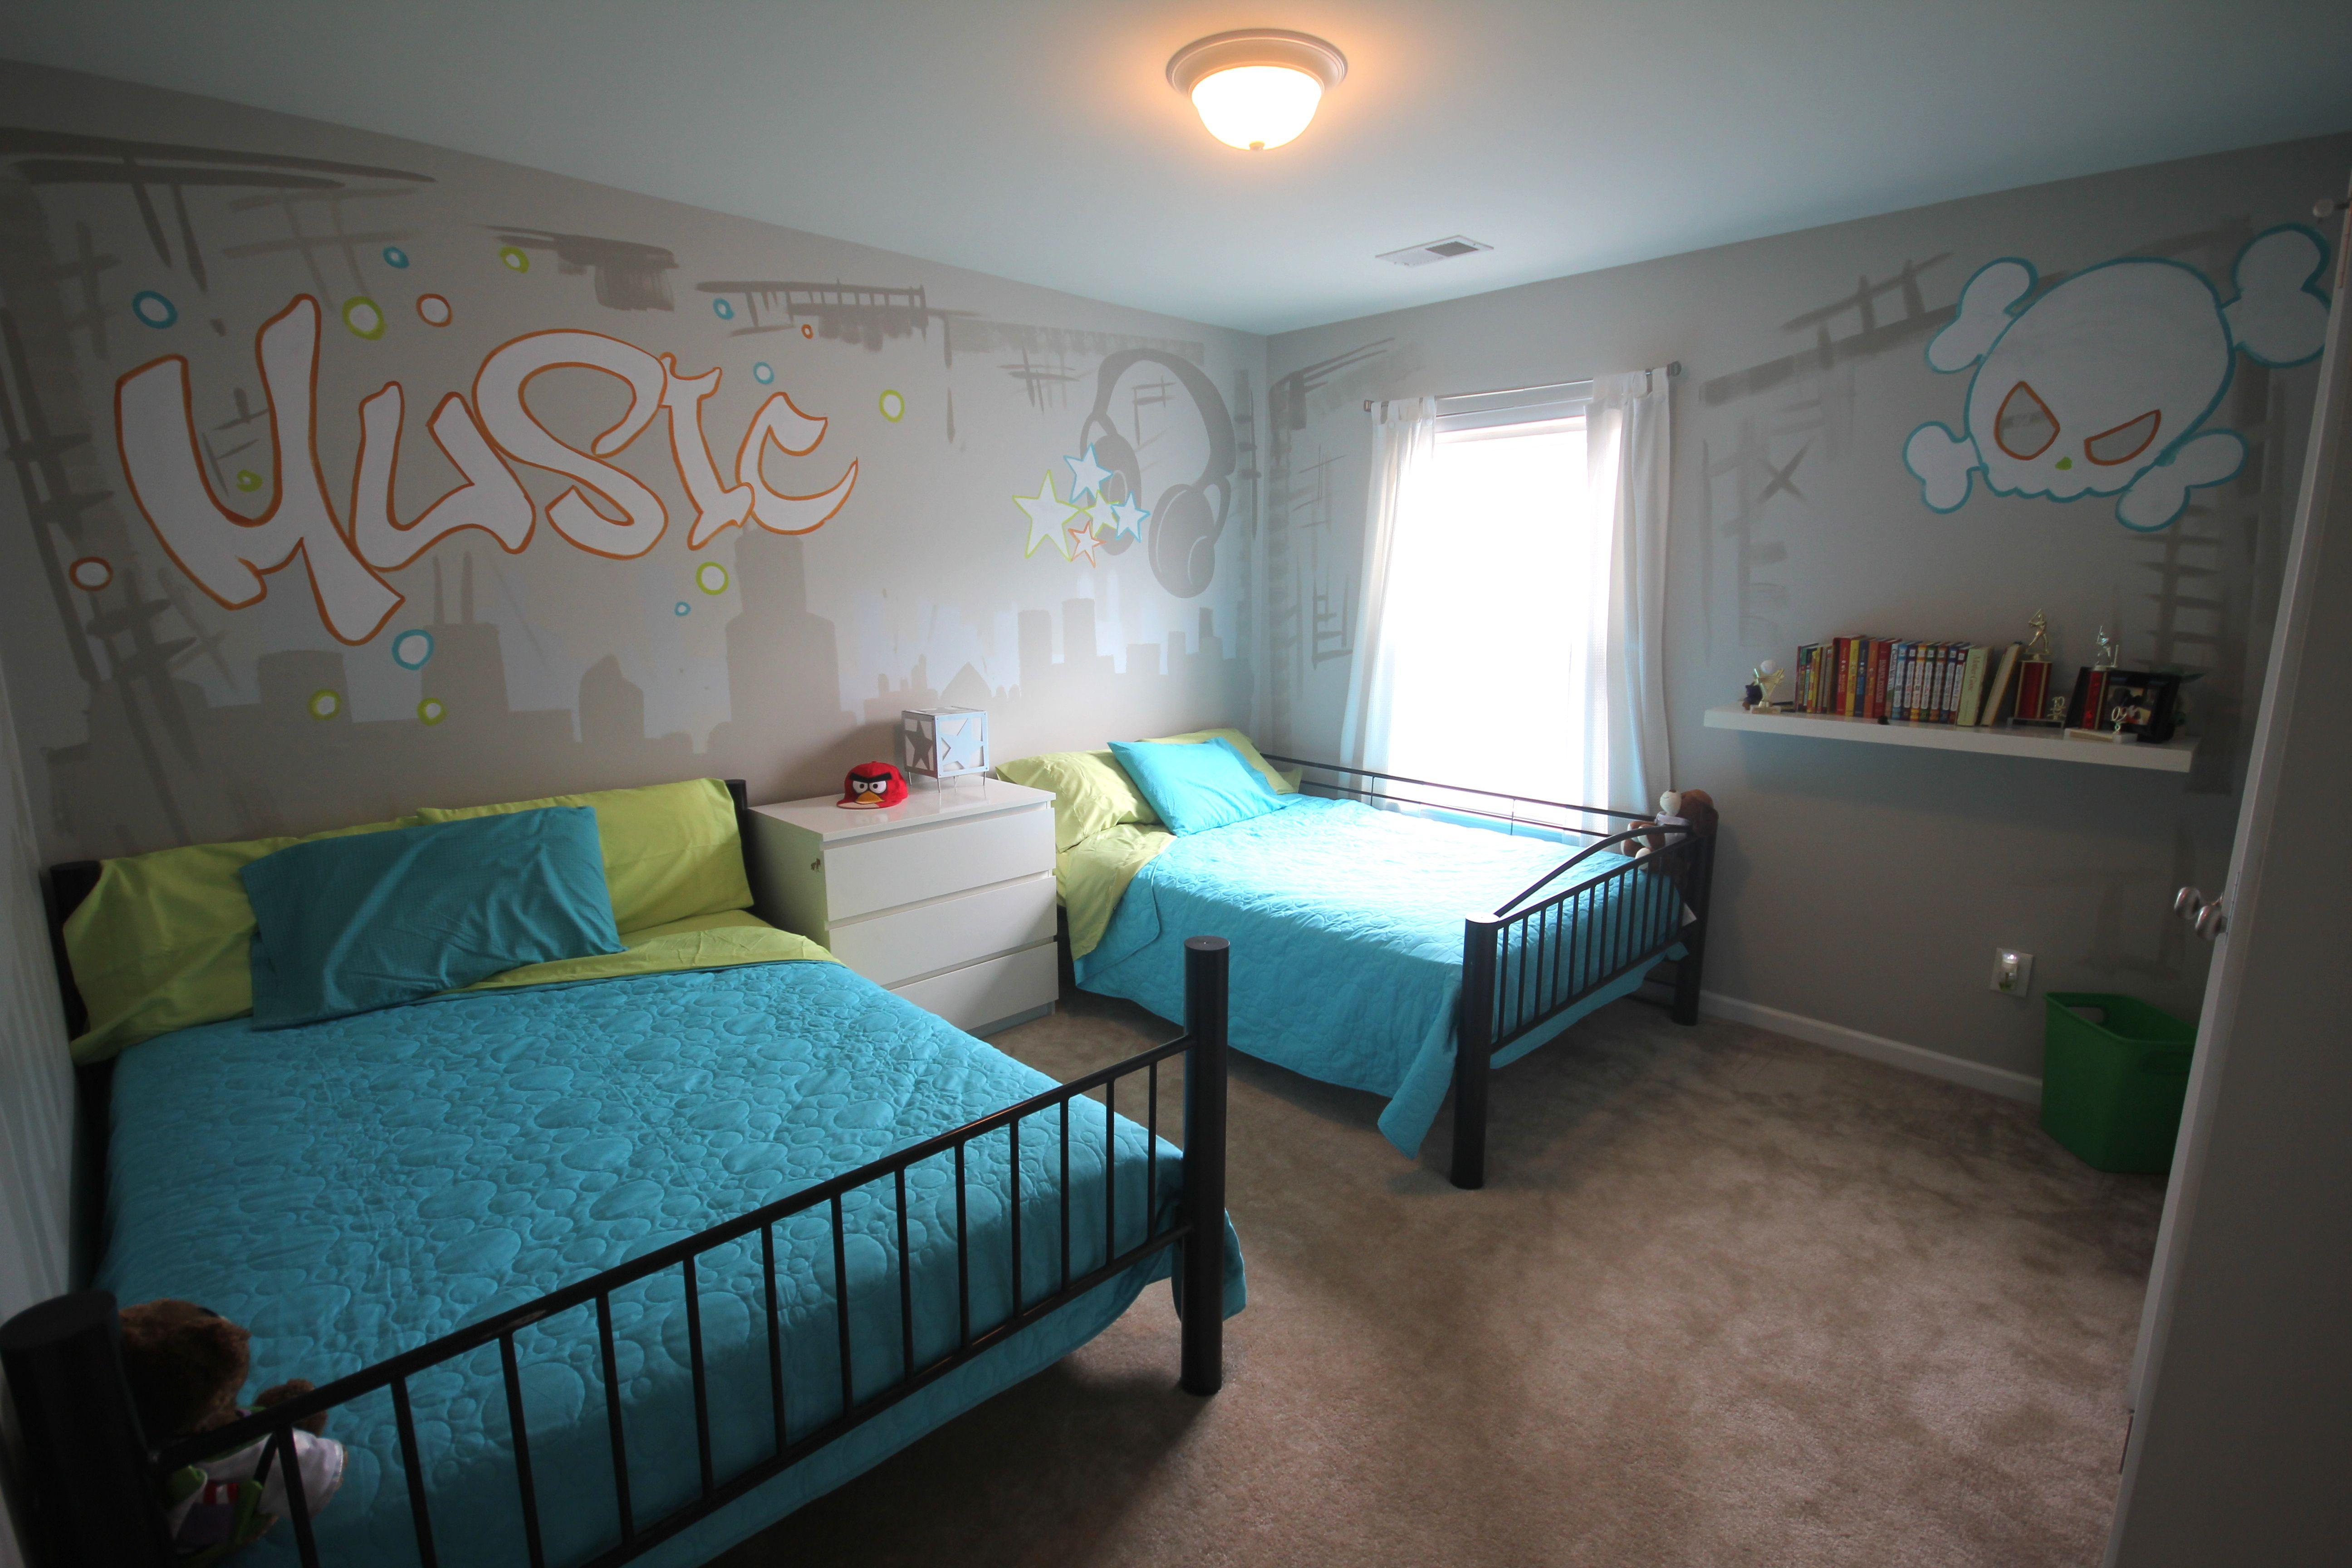 Kids Music Themed Room Bedroom Ideas For Kids Fun Gray Bedroom